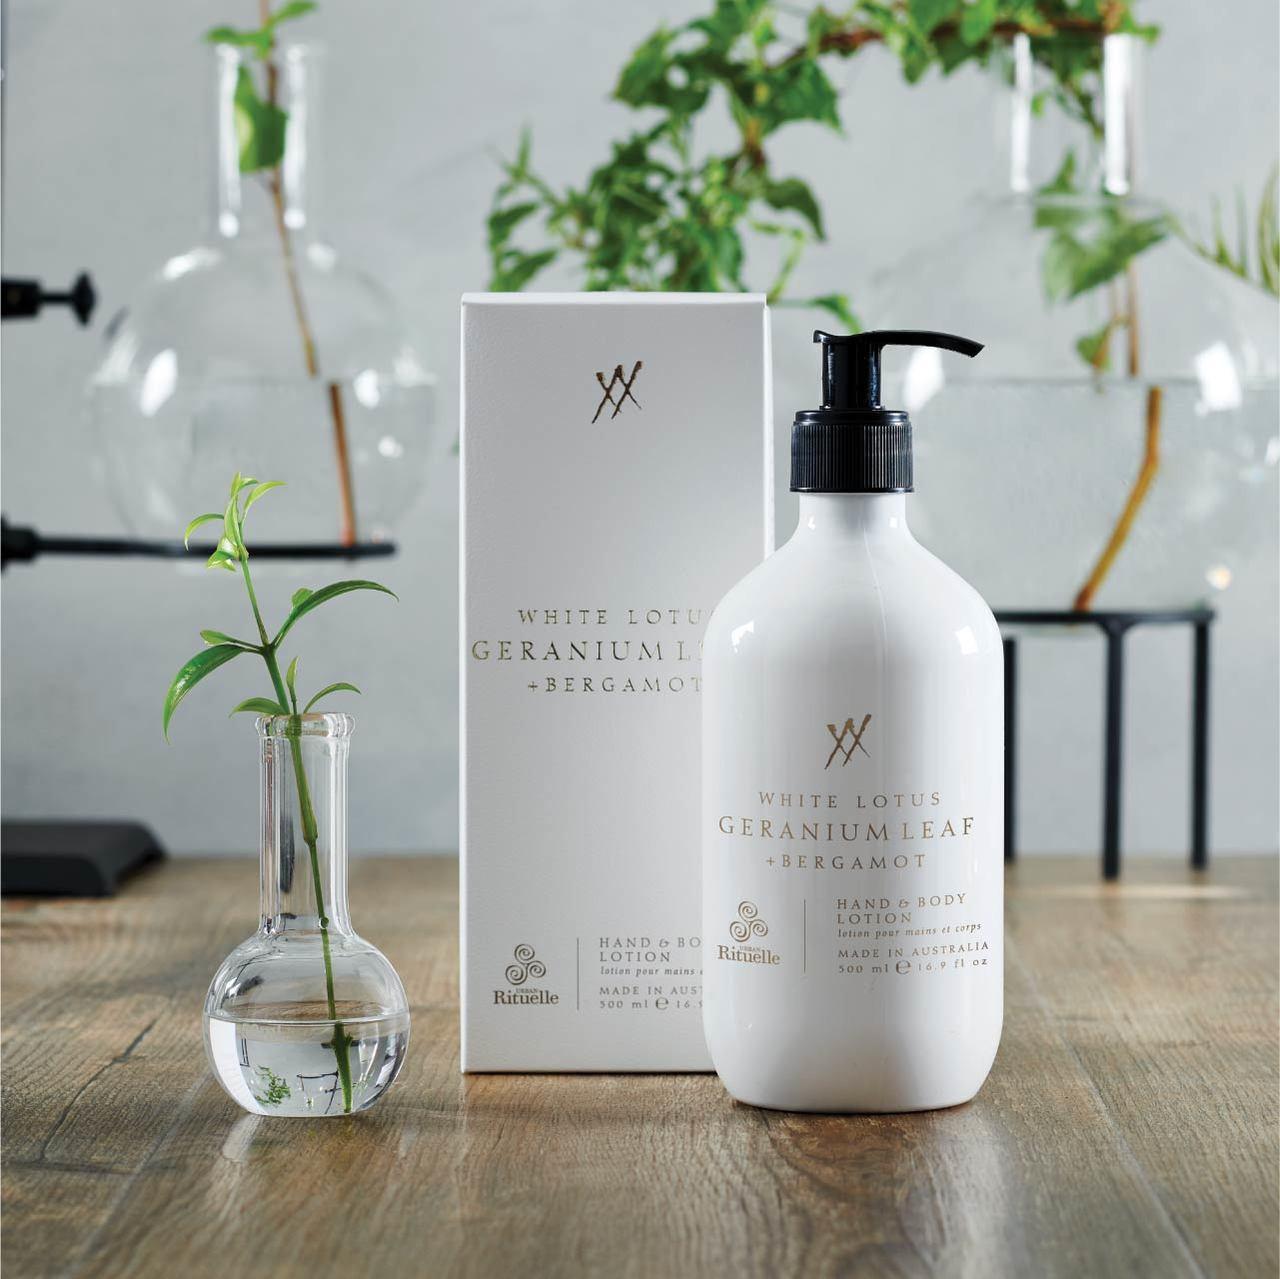 Alchemy - White Lotus, Geranium Leaf & Bergamot - Hand & Body Lotion - Urban Rituelle